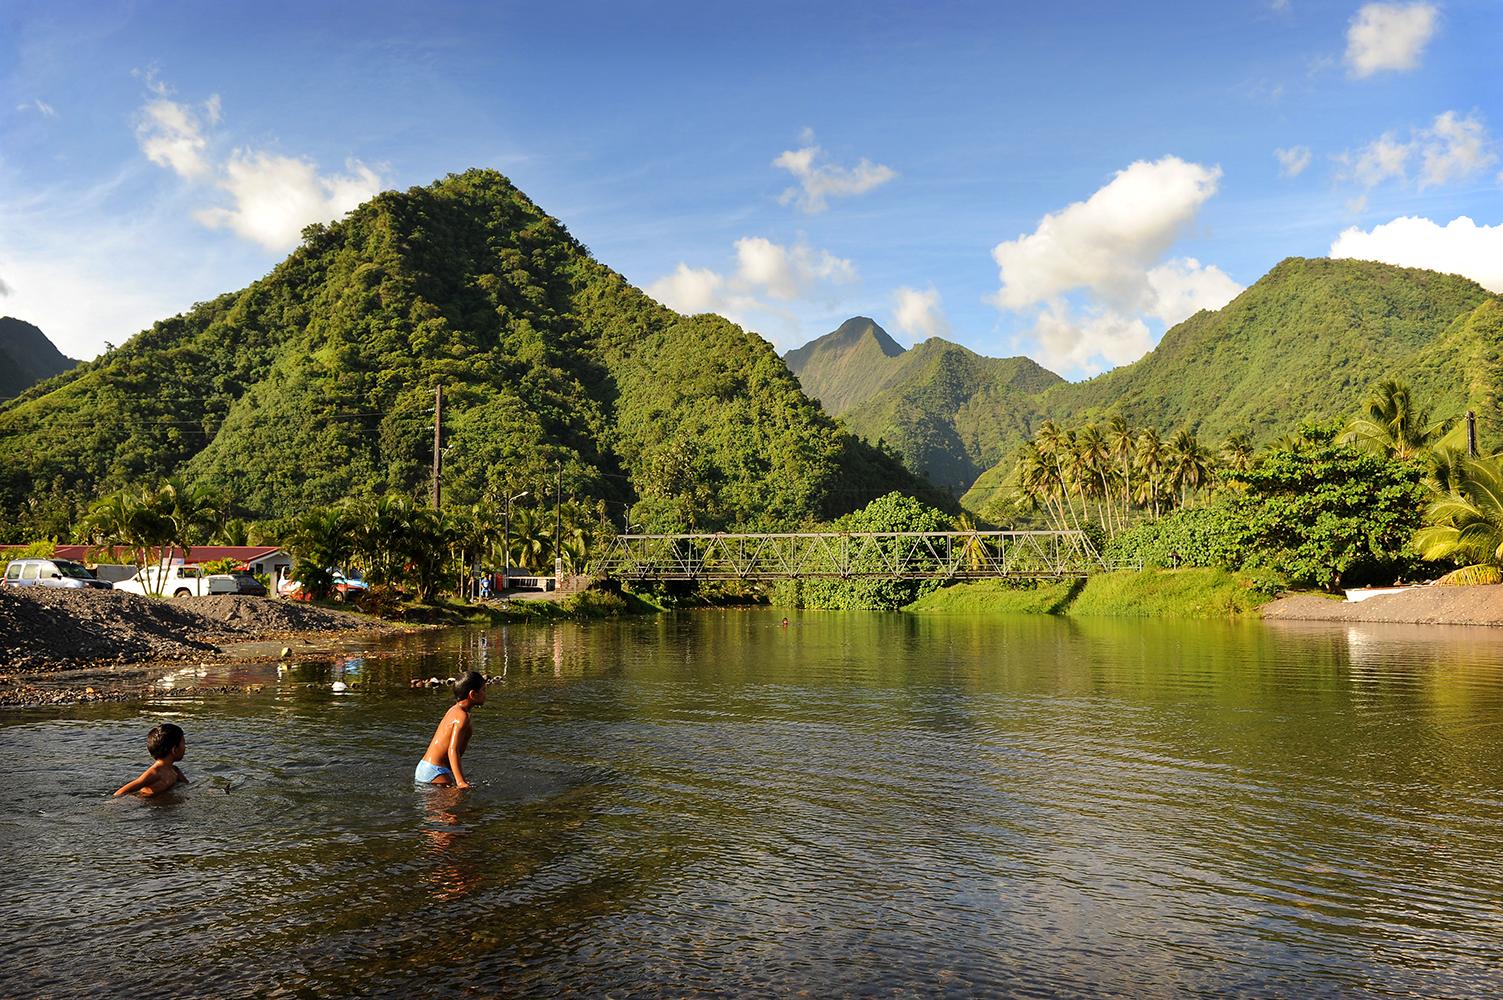 Ranta, Tahiti, matka, paratiisi, kaukomatka, Tyyni Valtameri, matkablogi